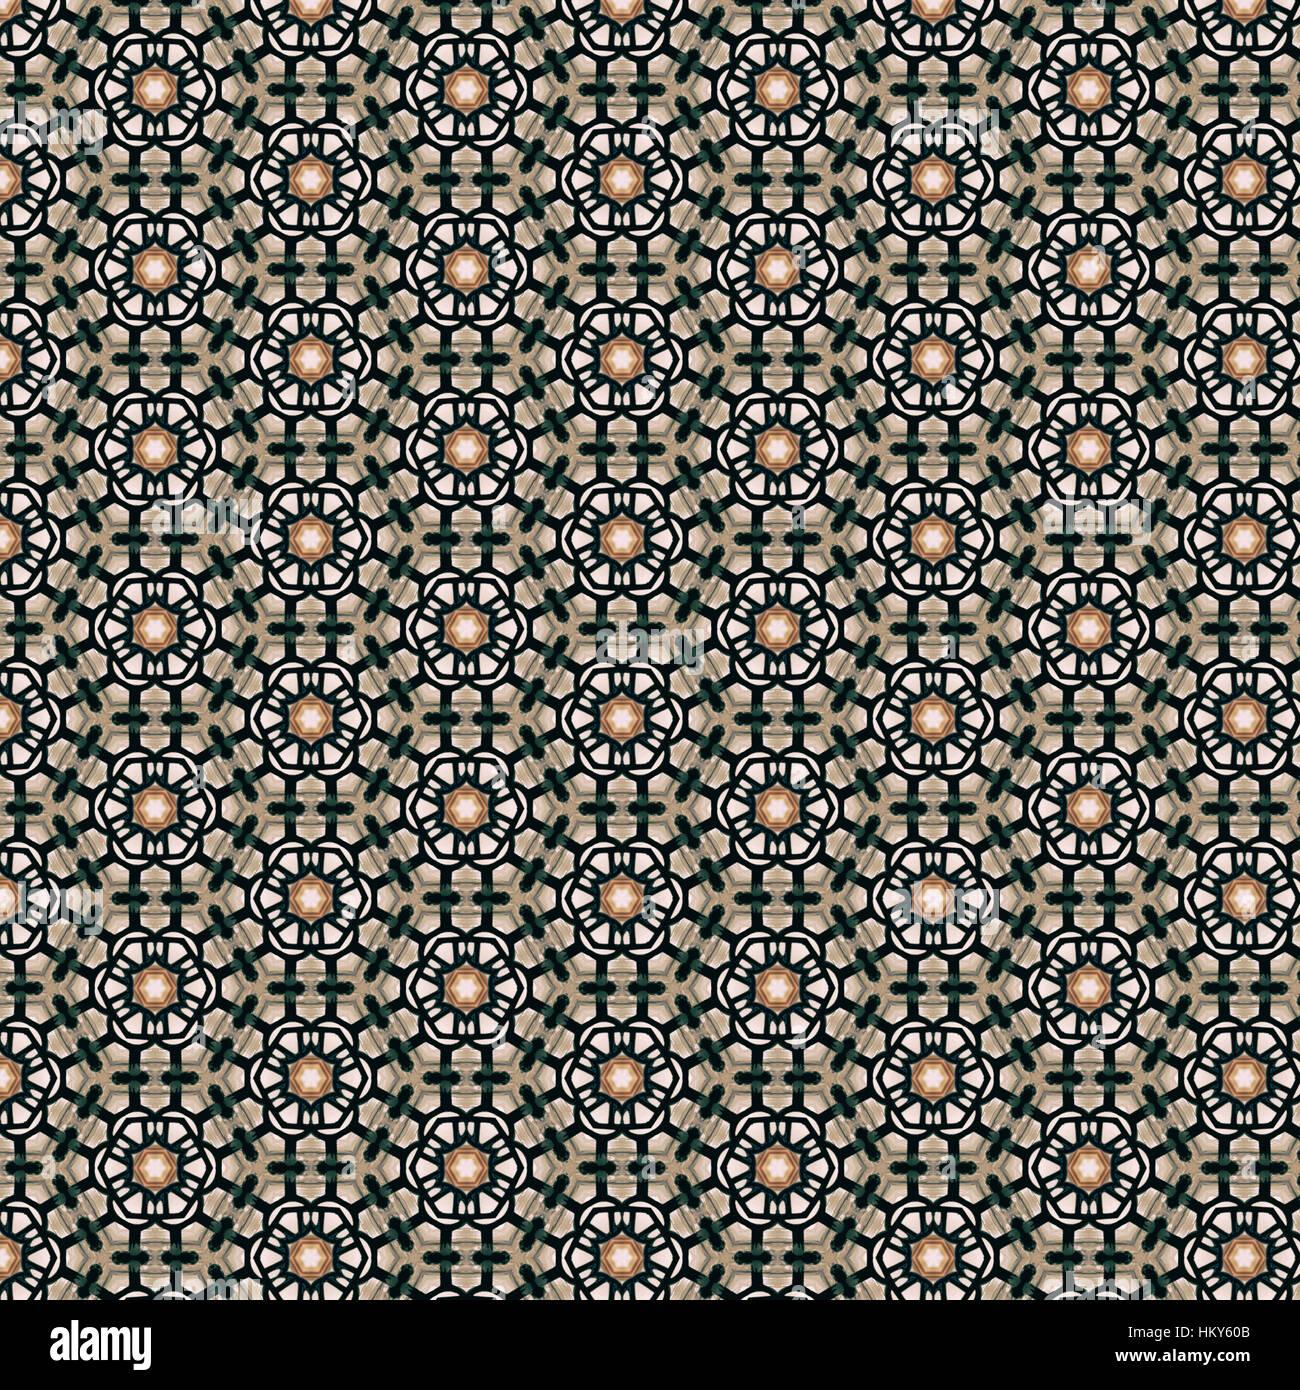 Vintage retro flower background pattern - Stock Image